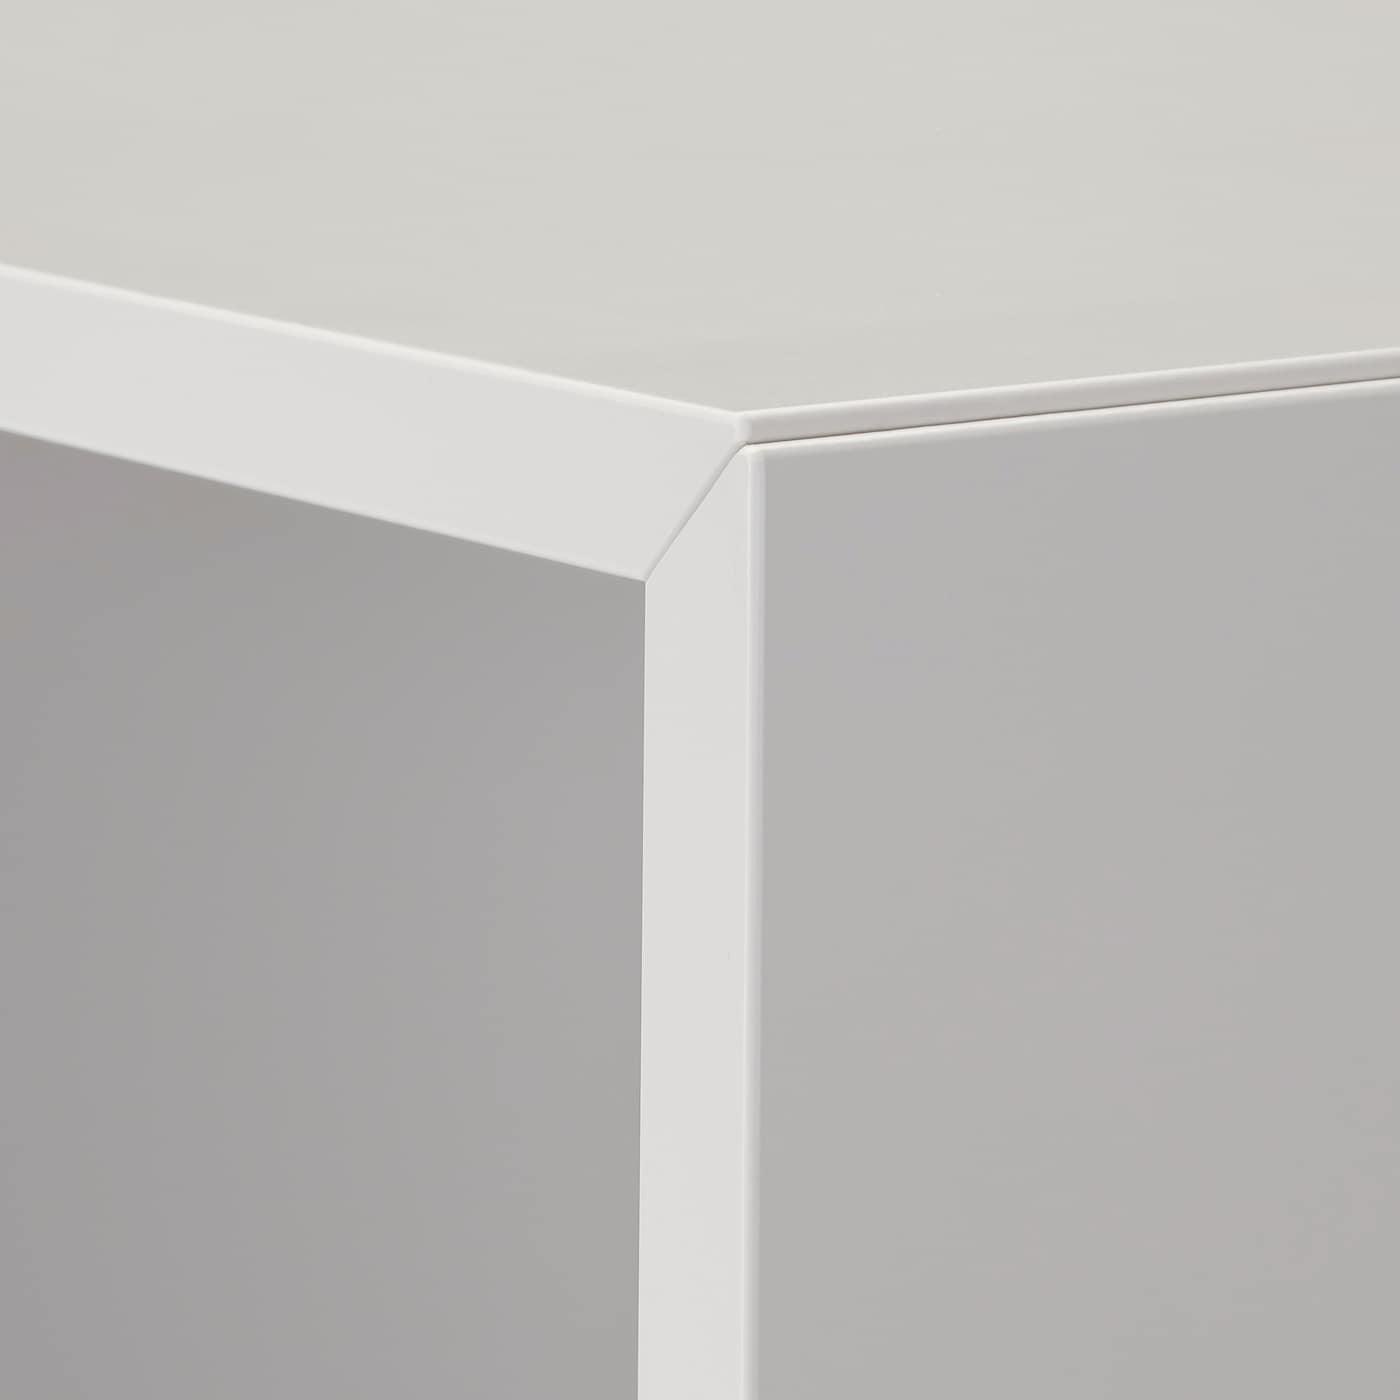 EKET Wall-mounted shelving unit, light grey, 35x35x35 cm